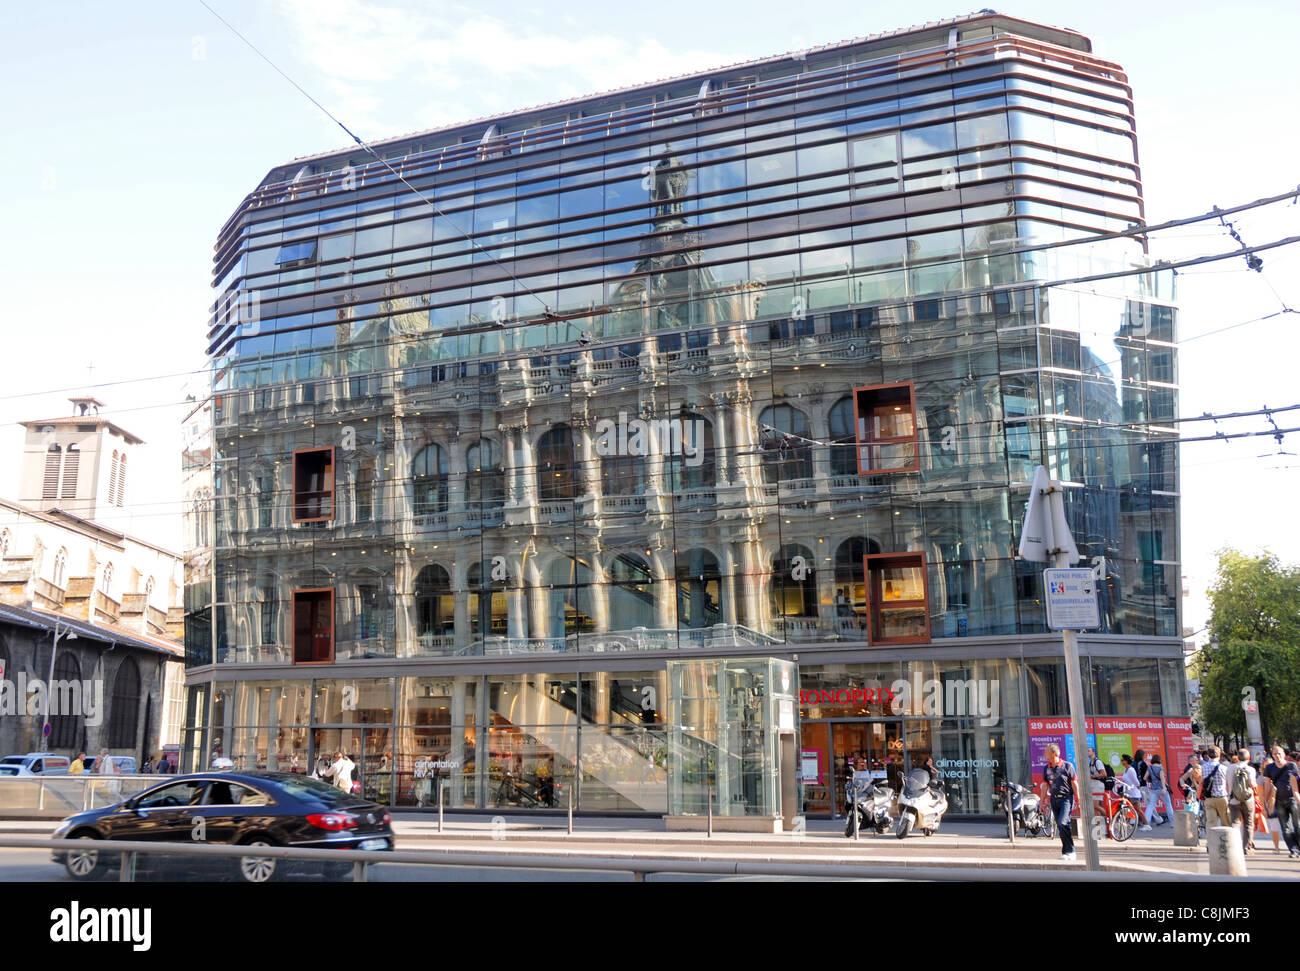 Grand Foyer Palais De La Bourse : Palais de la bourse reflected in glass facade of monoprix